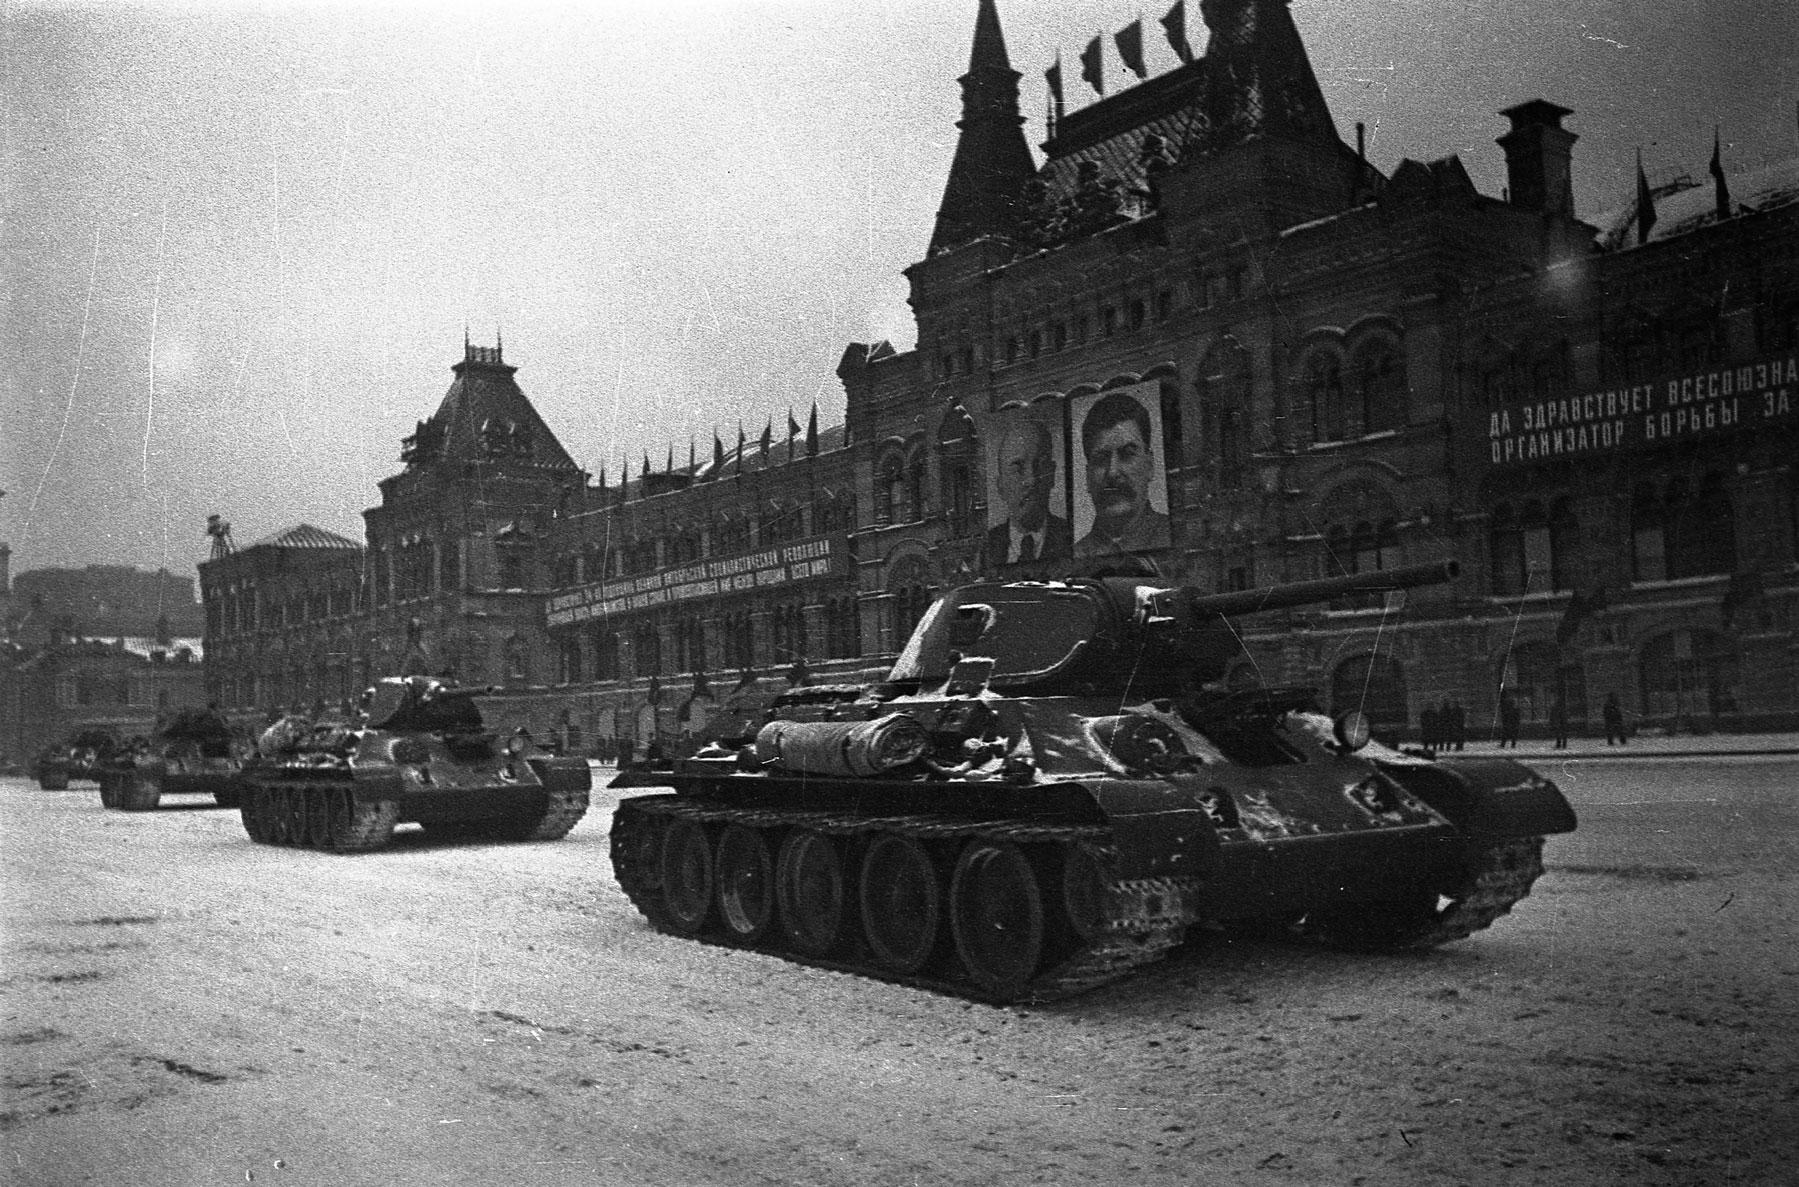 Парад 1941 г. на Красной площади открытки фото рисунки картинки поздравления